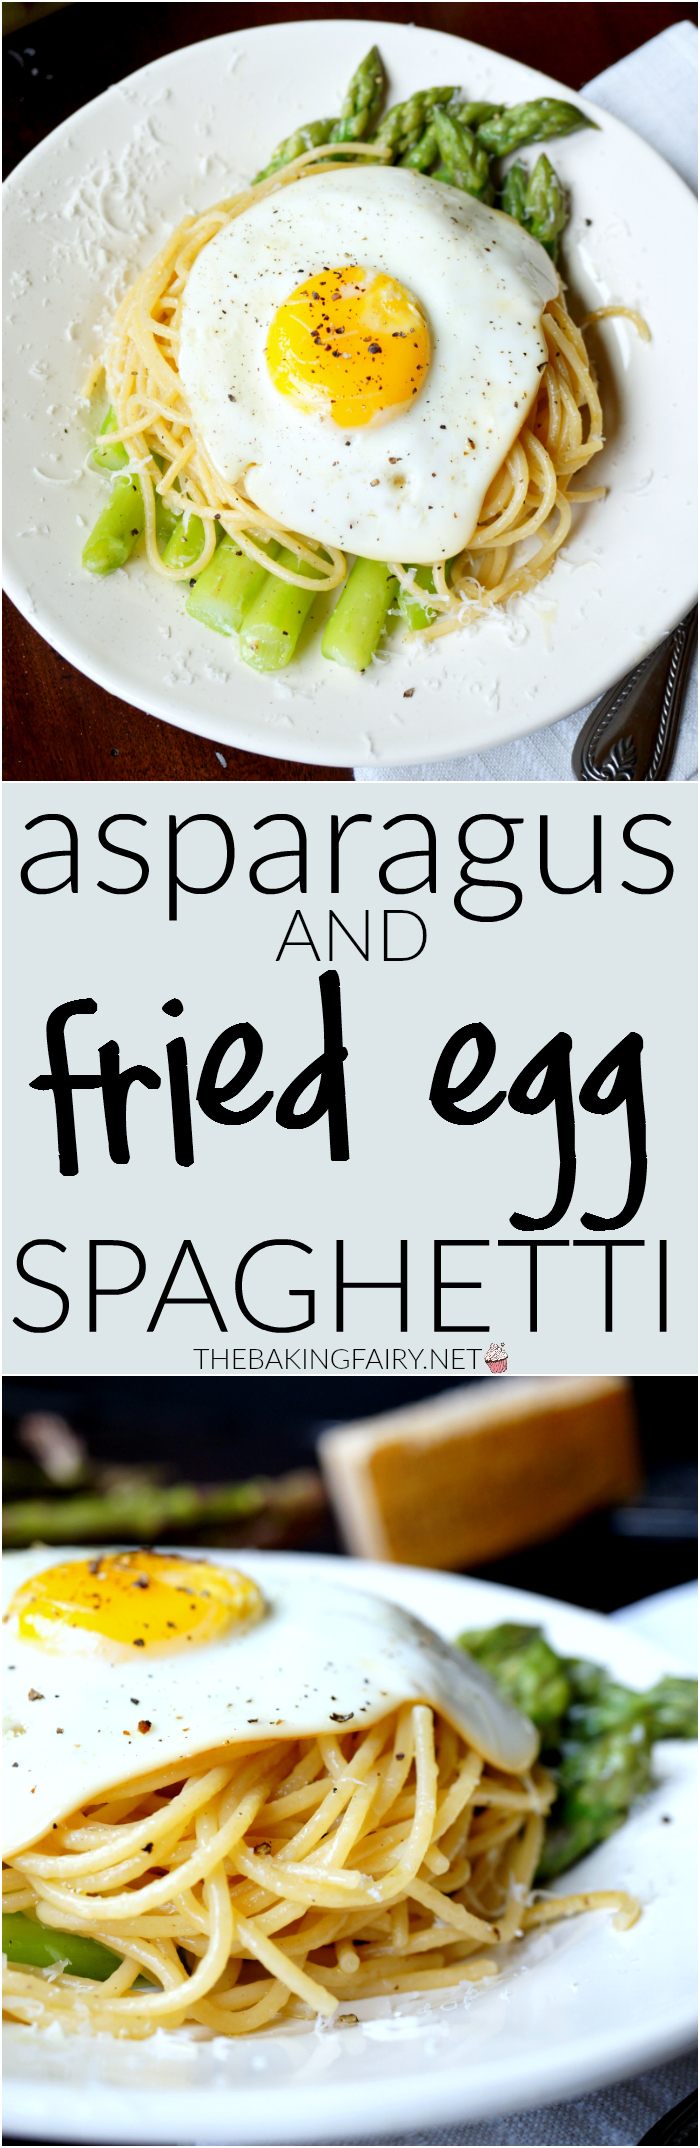 asparagus & fried egg spaghetti | The Baking Fairy